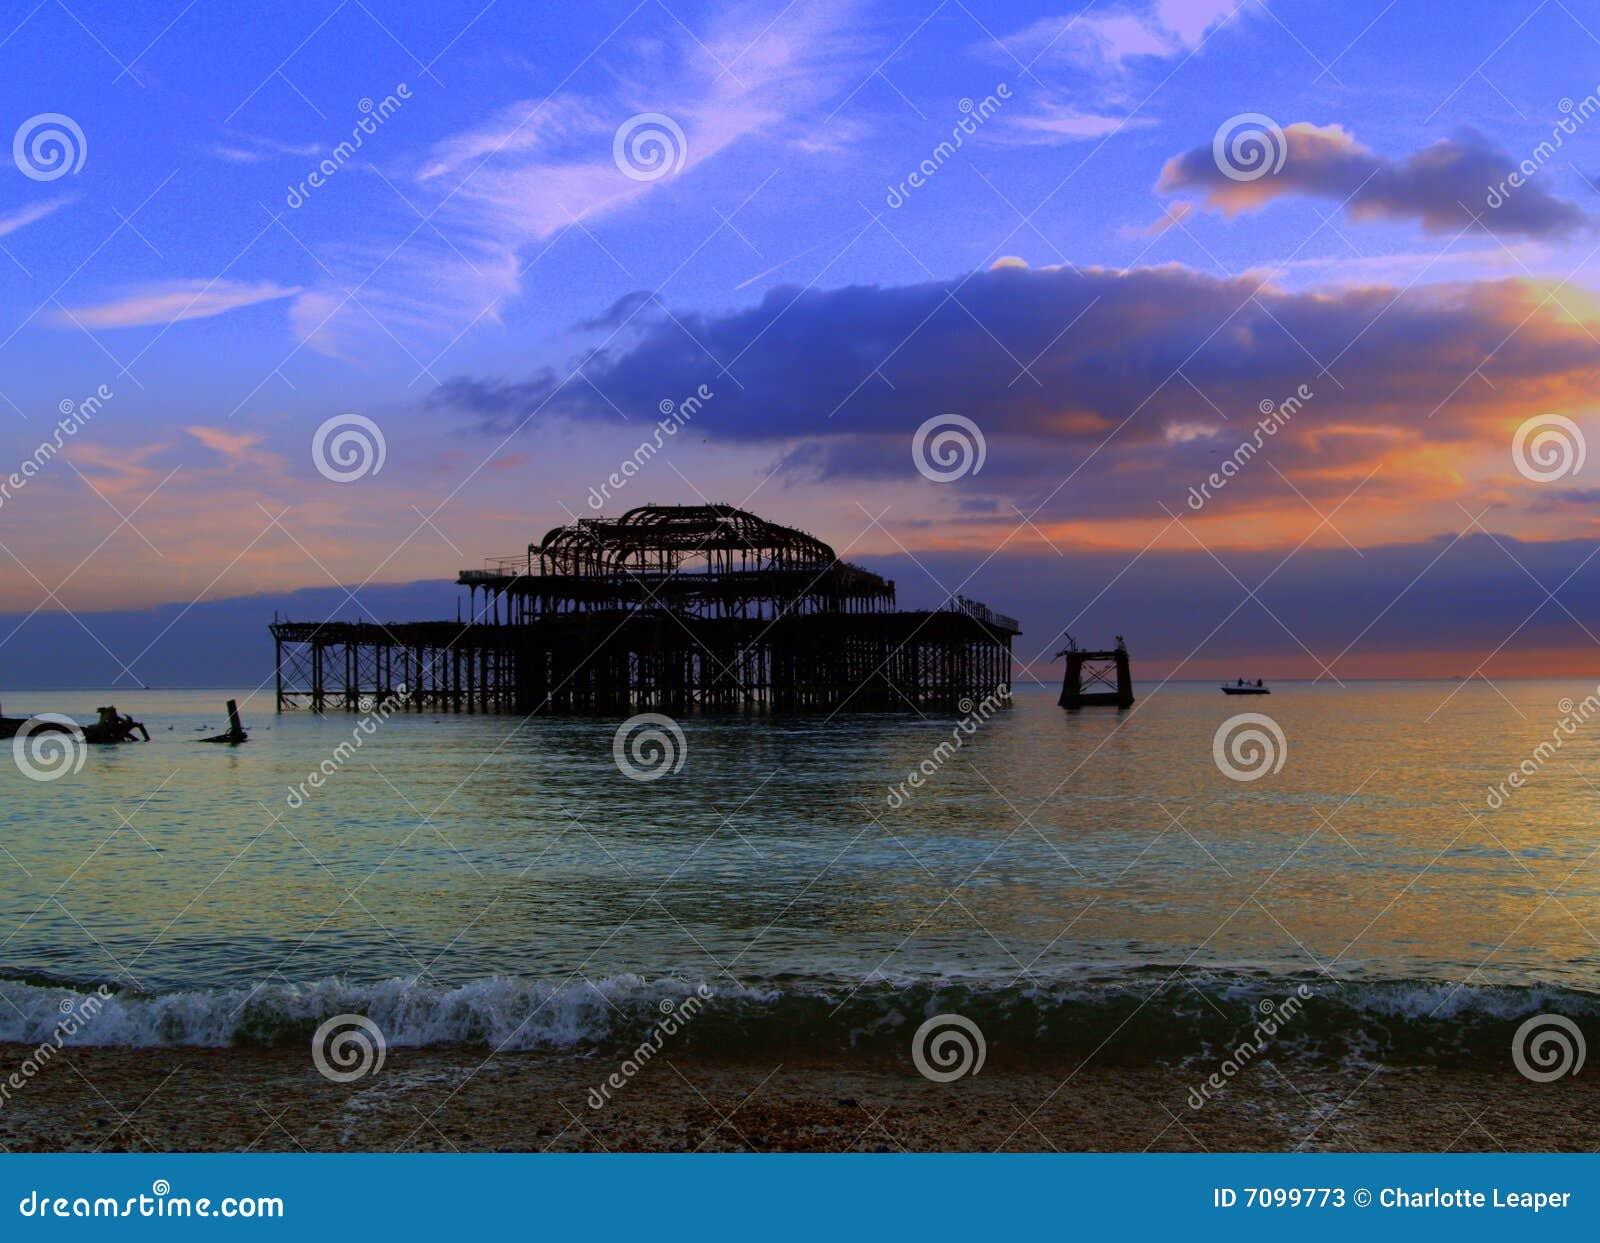 Old Brighton Pier sunset, England landscape